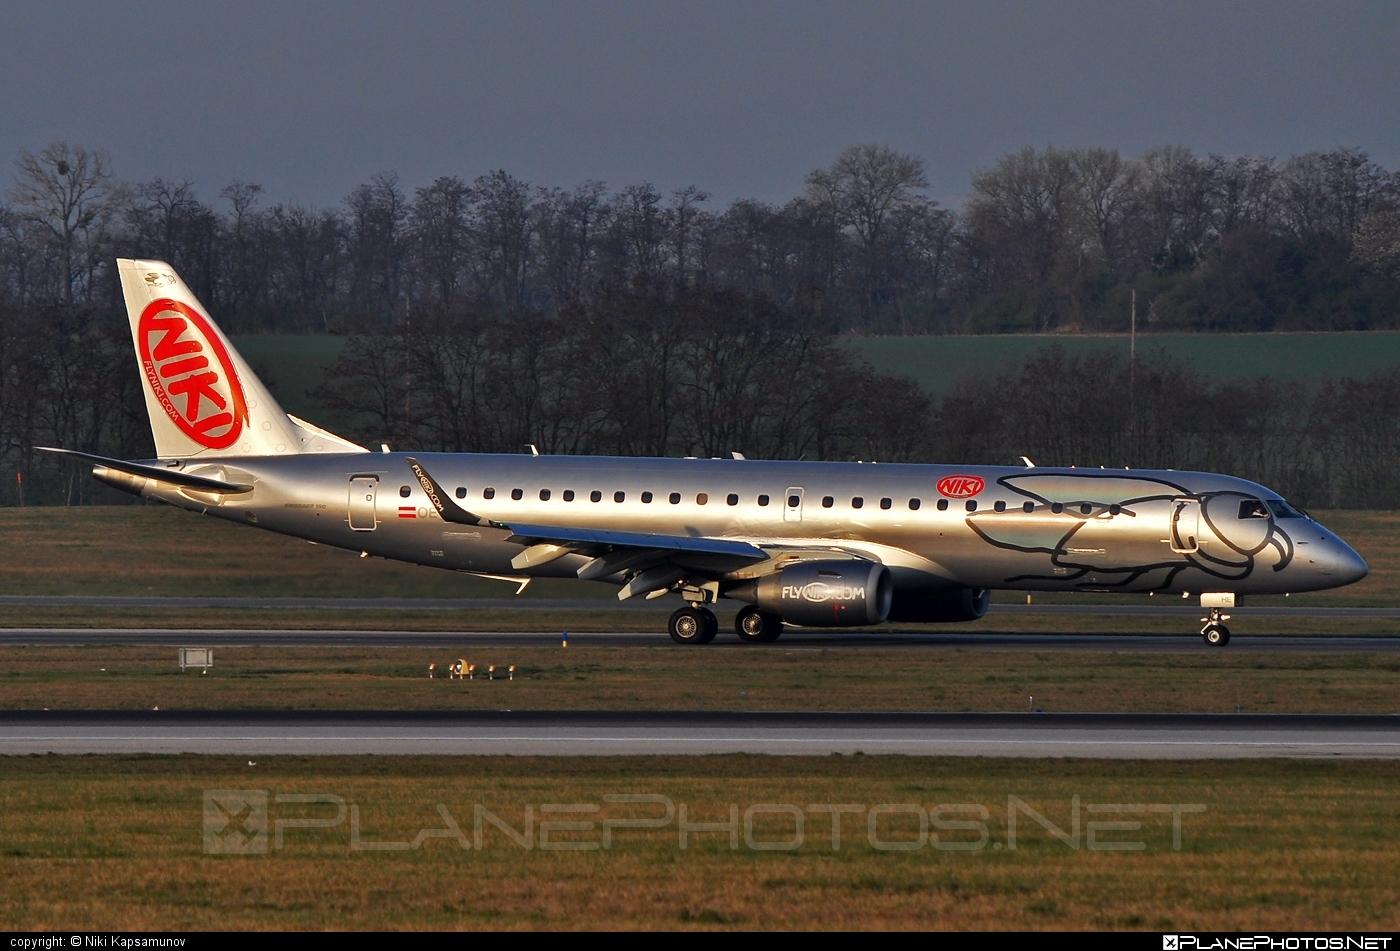 Embraer E190LR (ERJ-190-100LR) - OE-IHE operated by Niki #e190 #e190100 #e190100lr #e190lr #embraer #embraer190 #embraer190100lr #embraer190lr #flyniki #niki